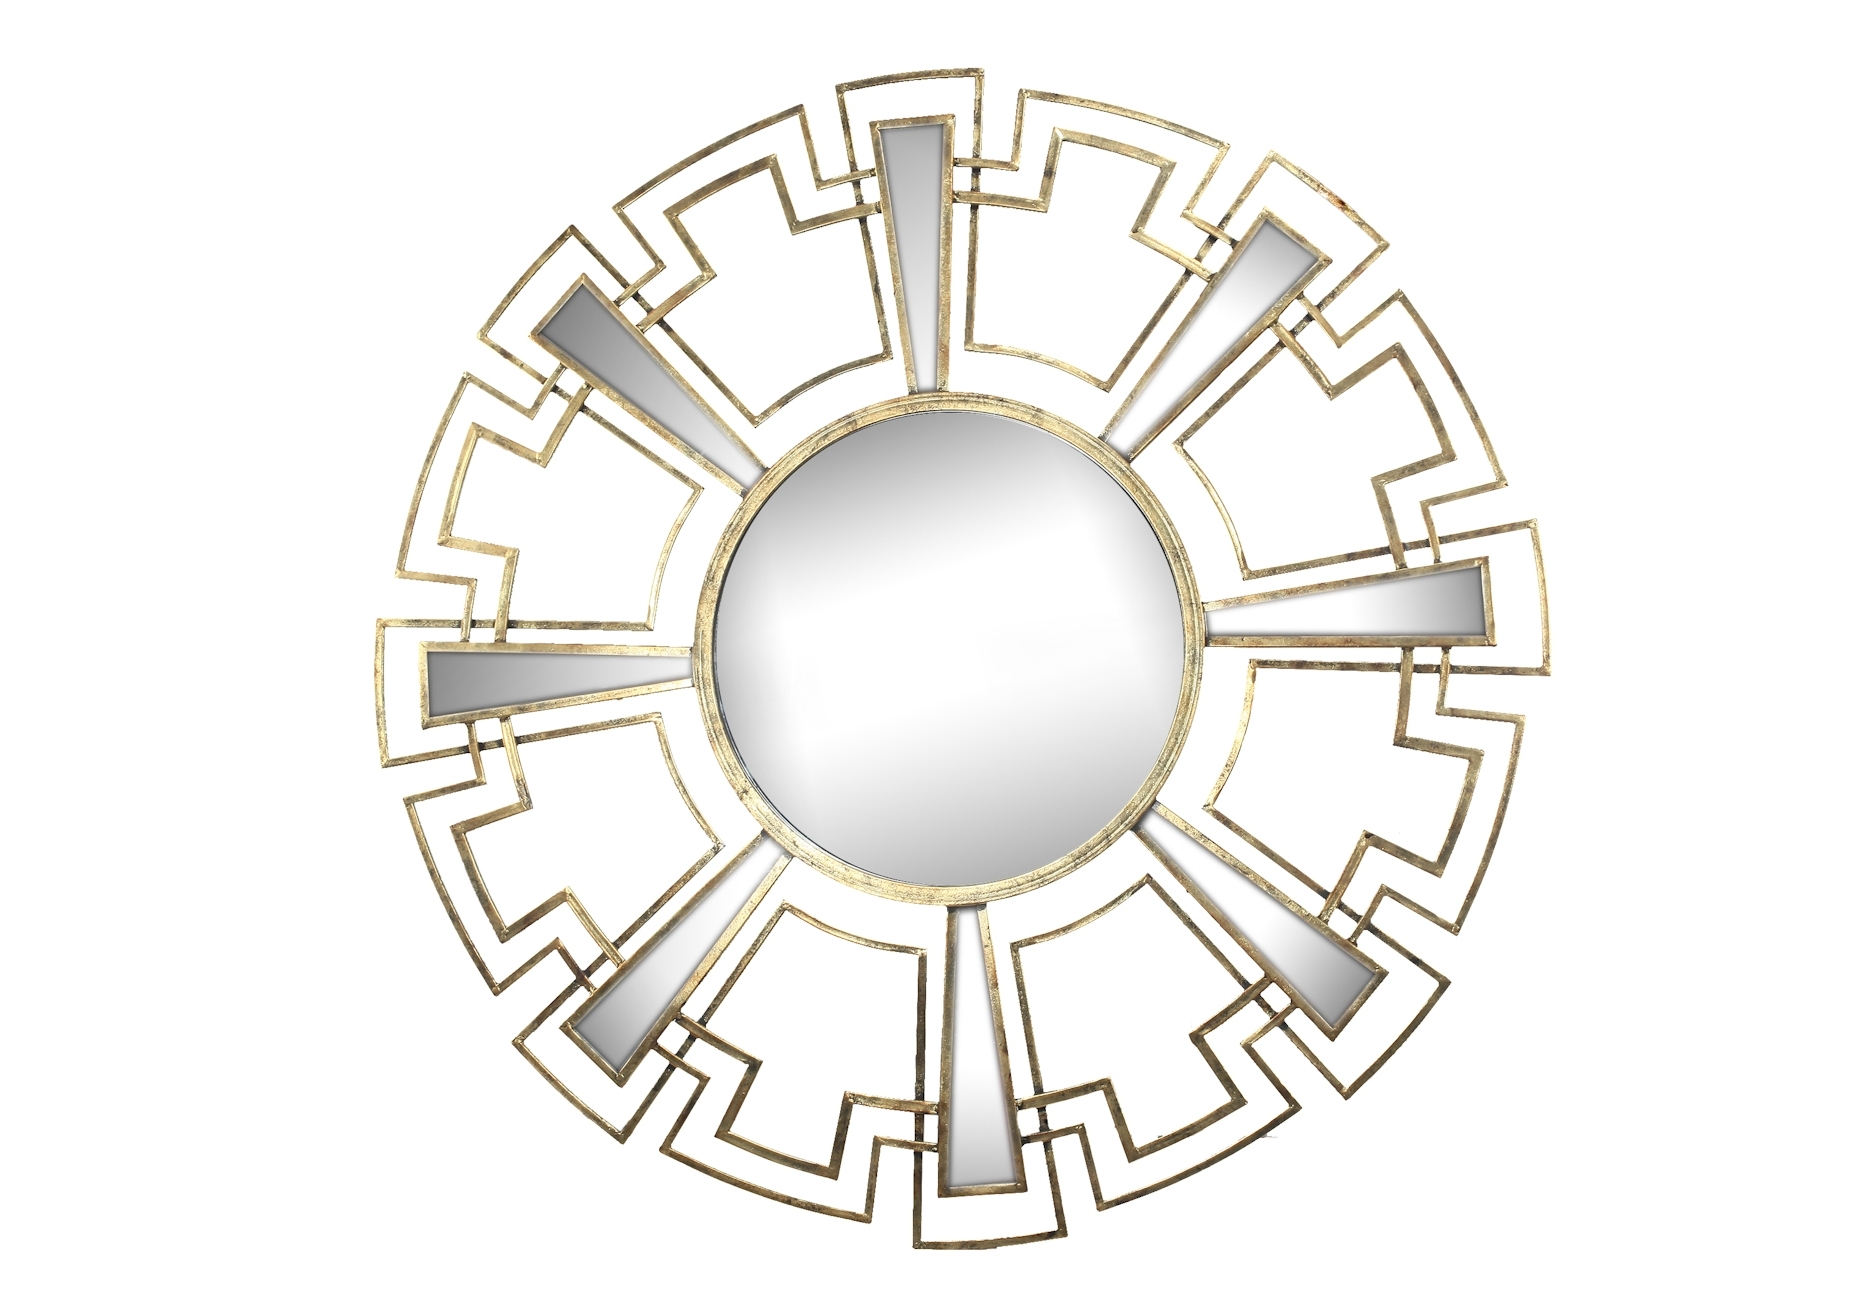 Зеркало настенноеНастенные зеркала<br>Вес 11.2 кг.<br><br>Material: Металл<br>Depth см: 3<br>Height см: None<br>Diameter см: 117